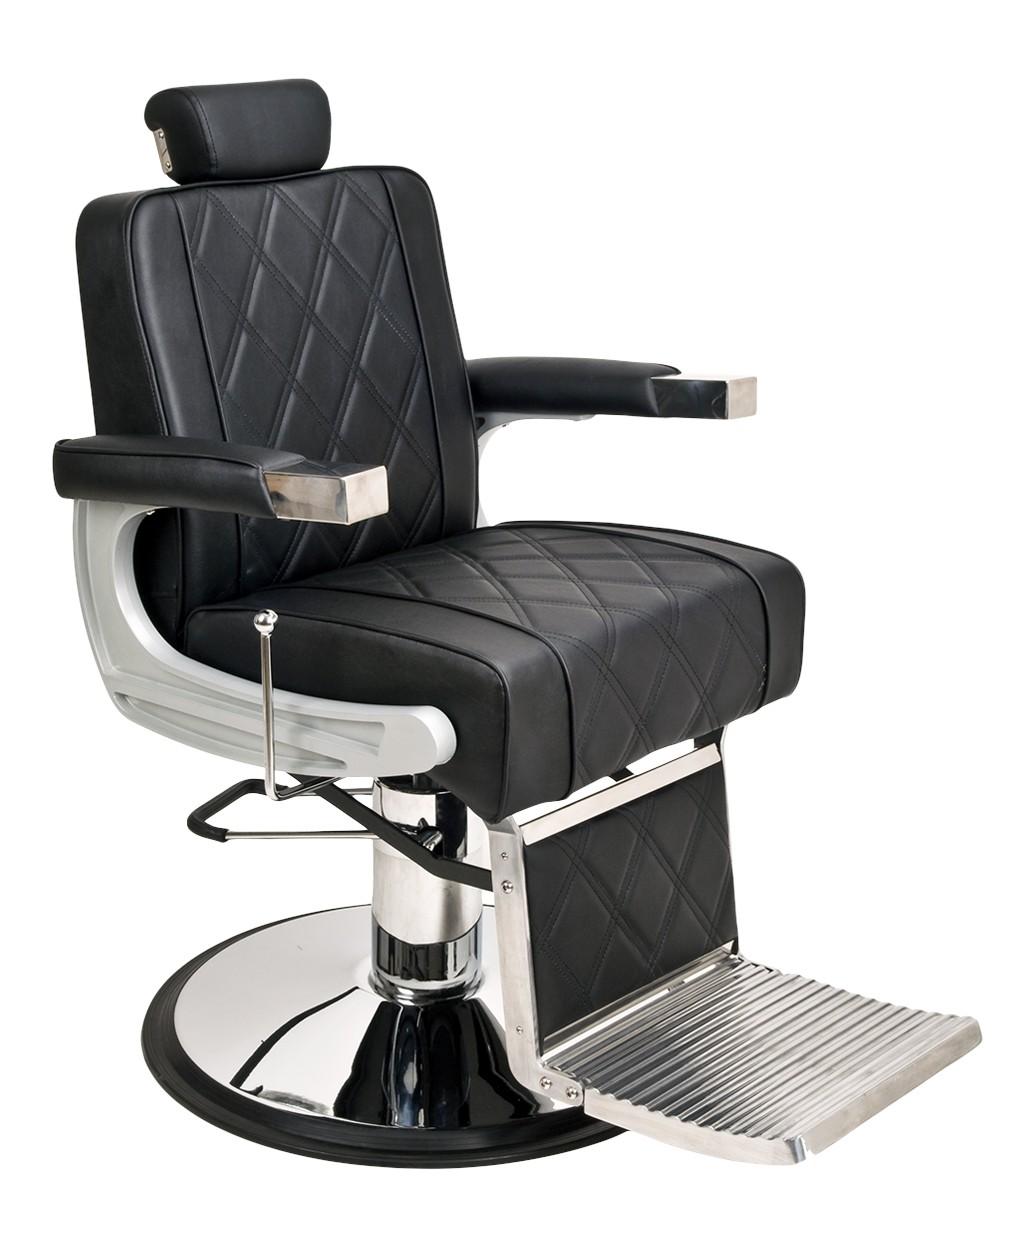 Maddox Professional Barber Chair